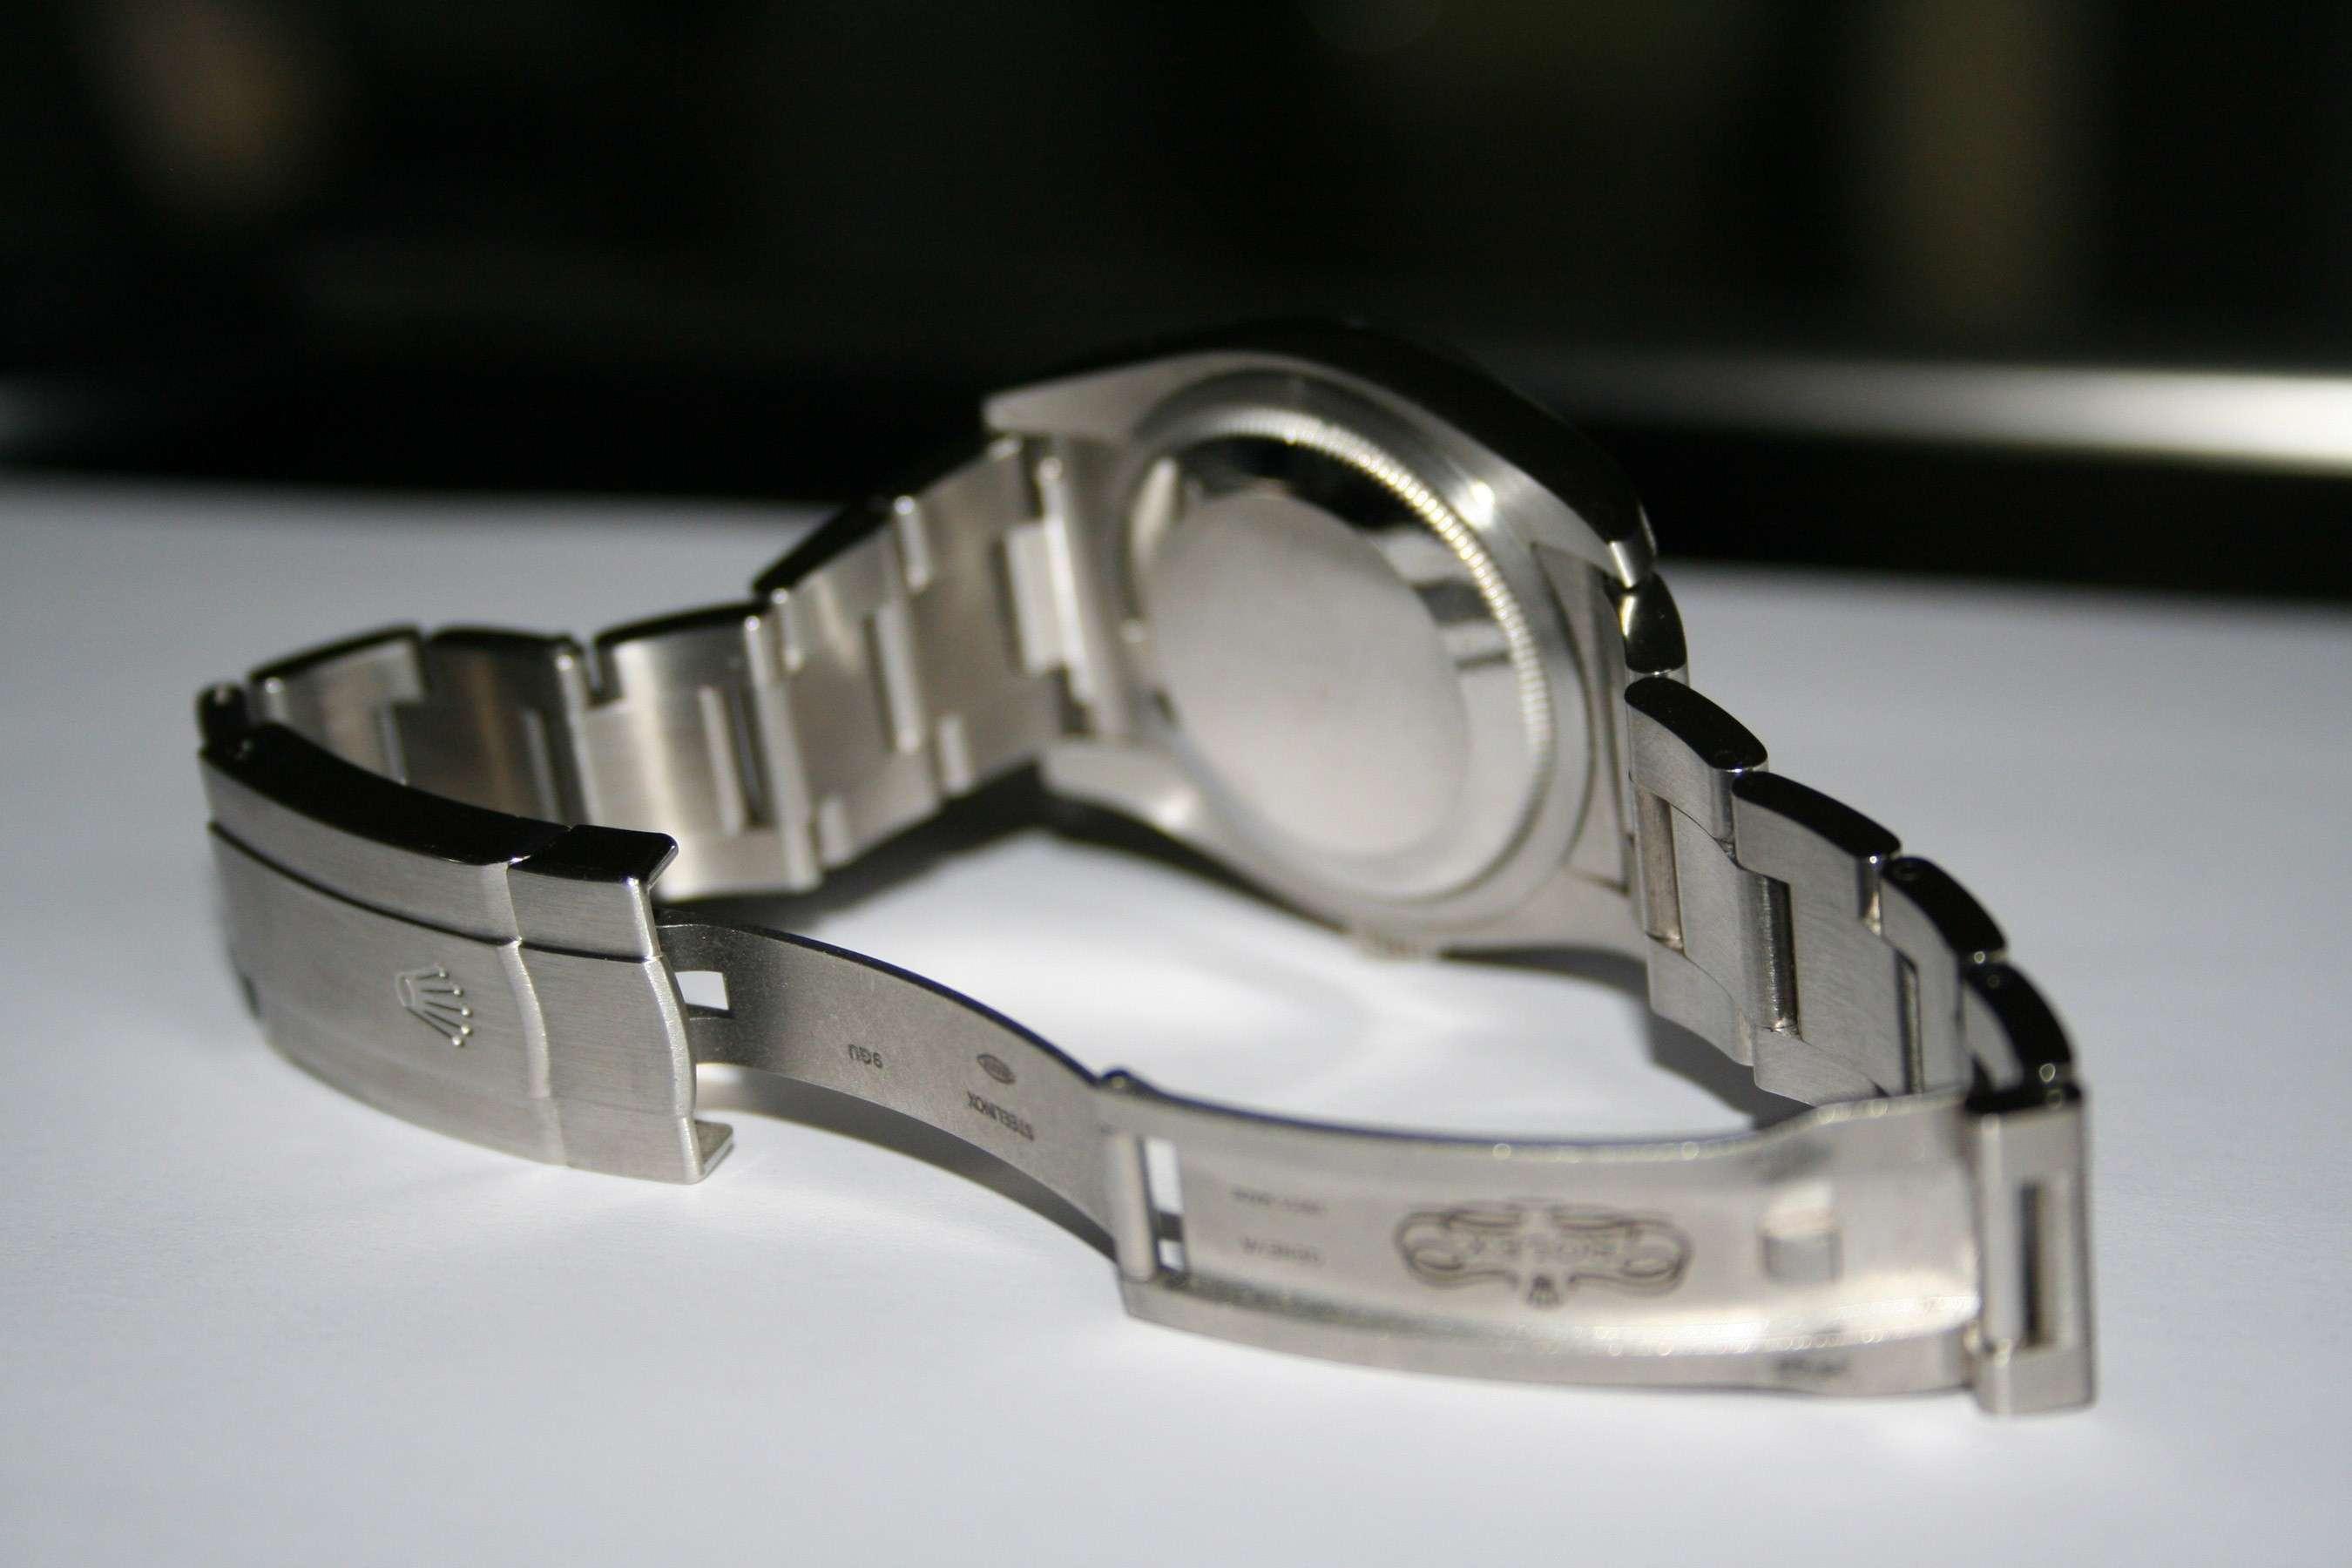 [Vends] Rolex Oyster Perpetual 116000 cadran bleu - comme neuve 311